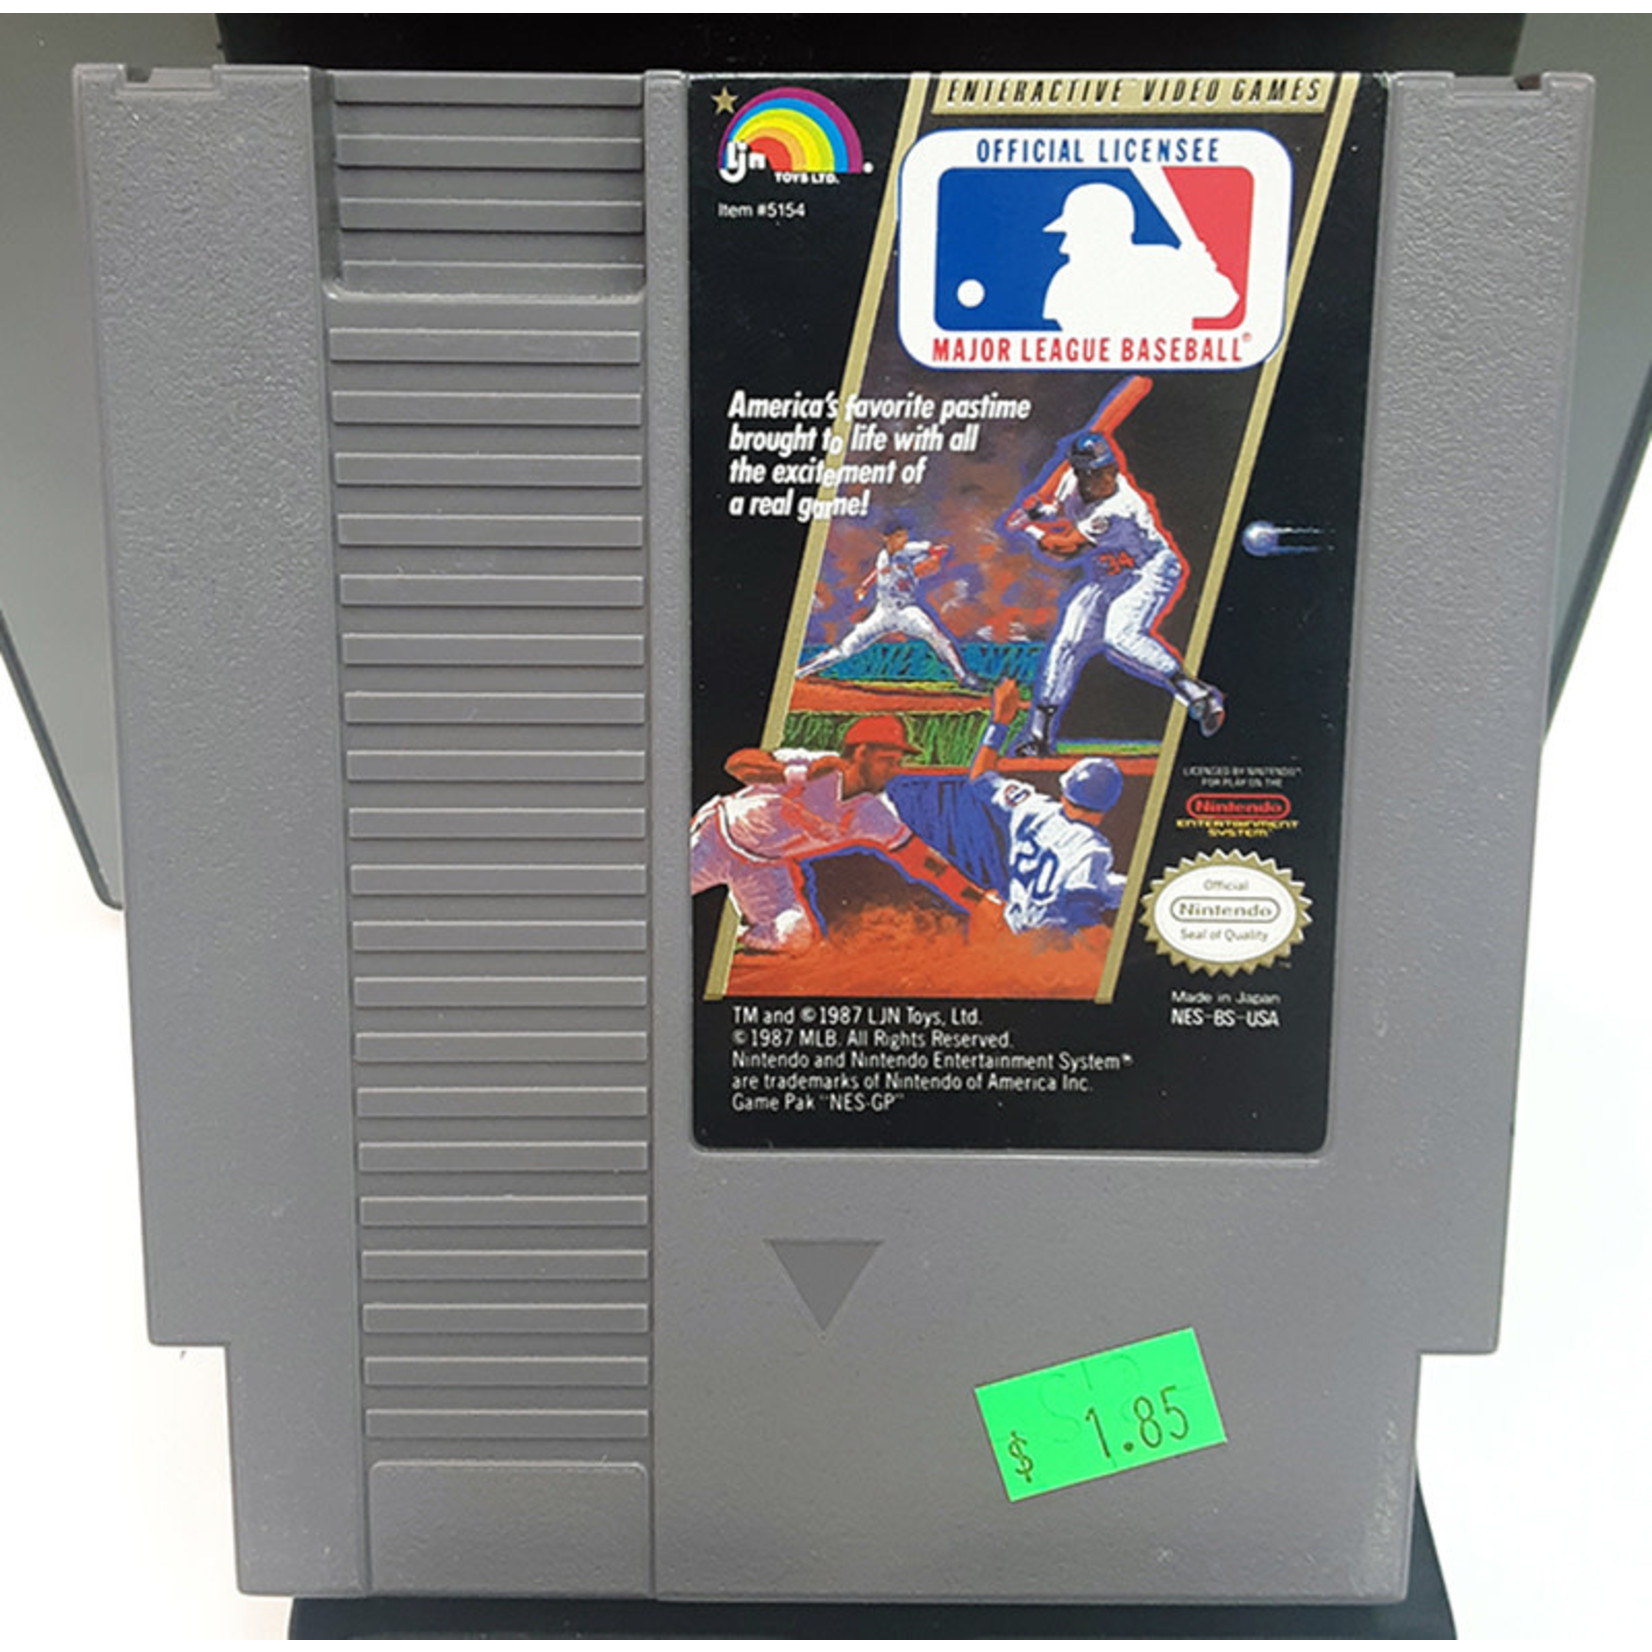 nesu-Major League Baseball (cartridge)